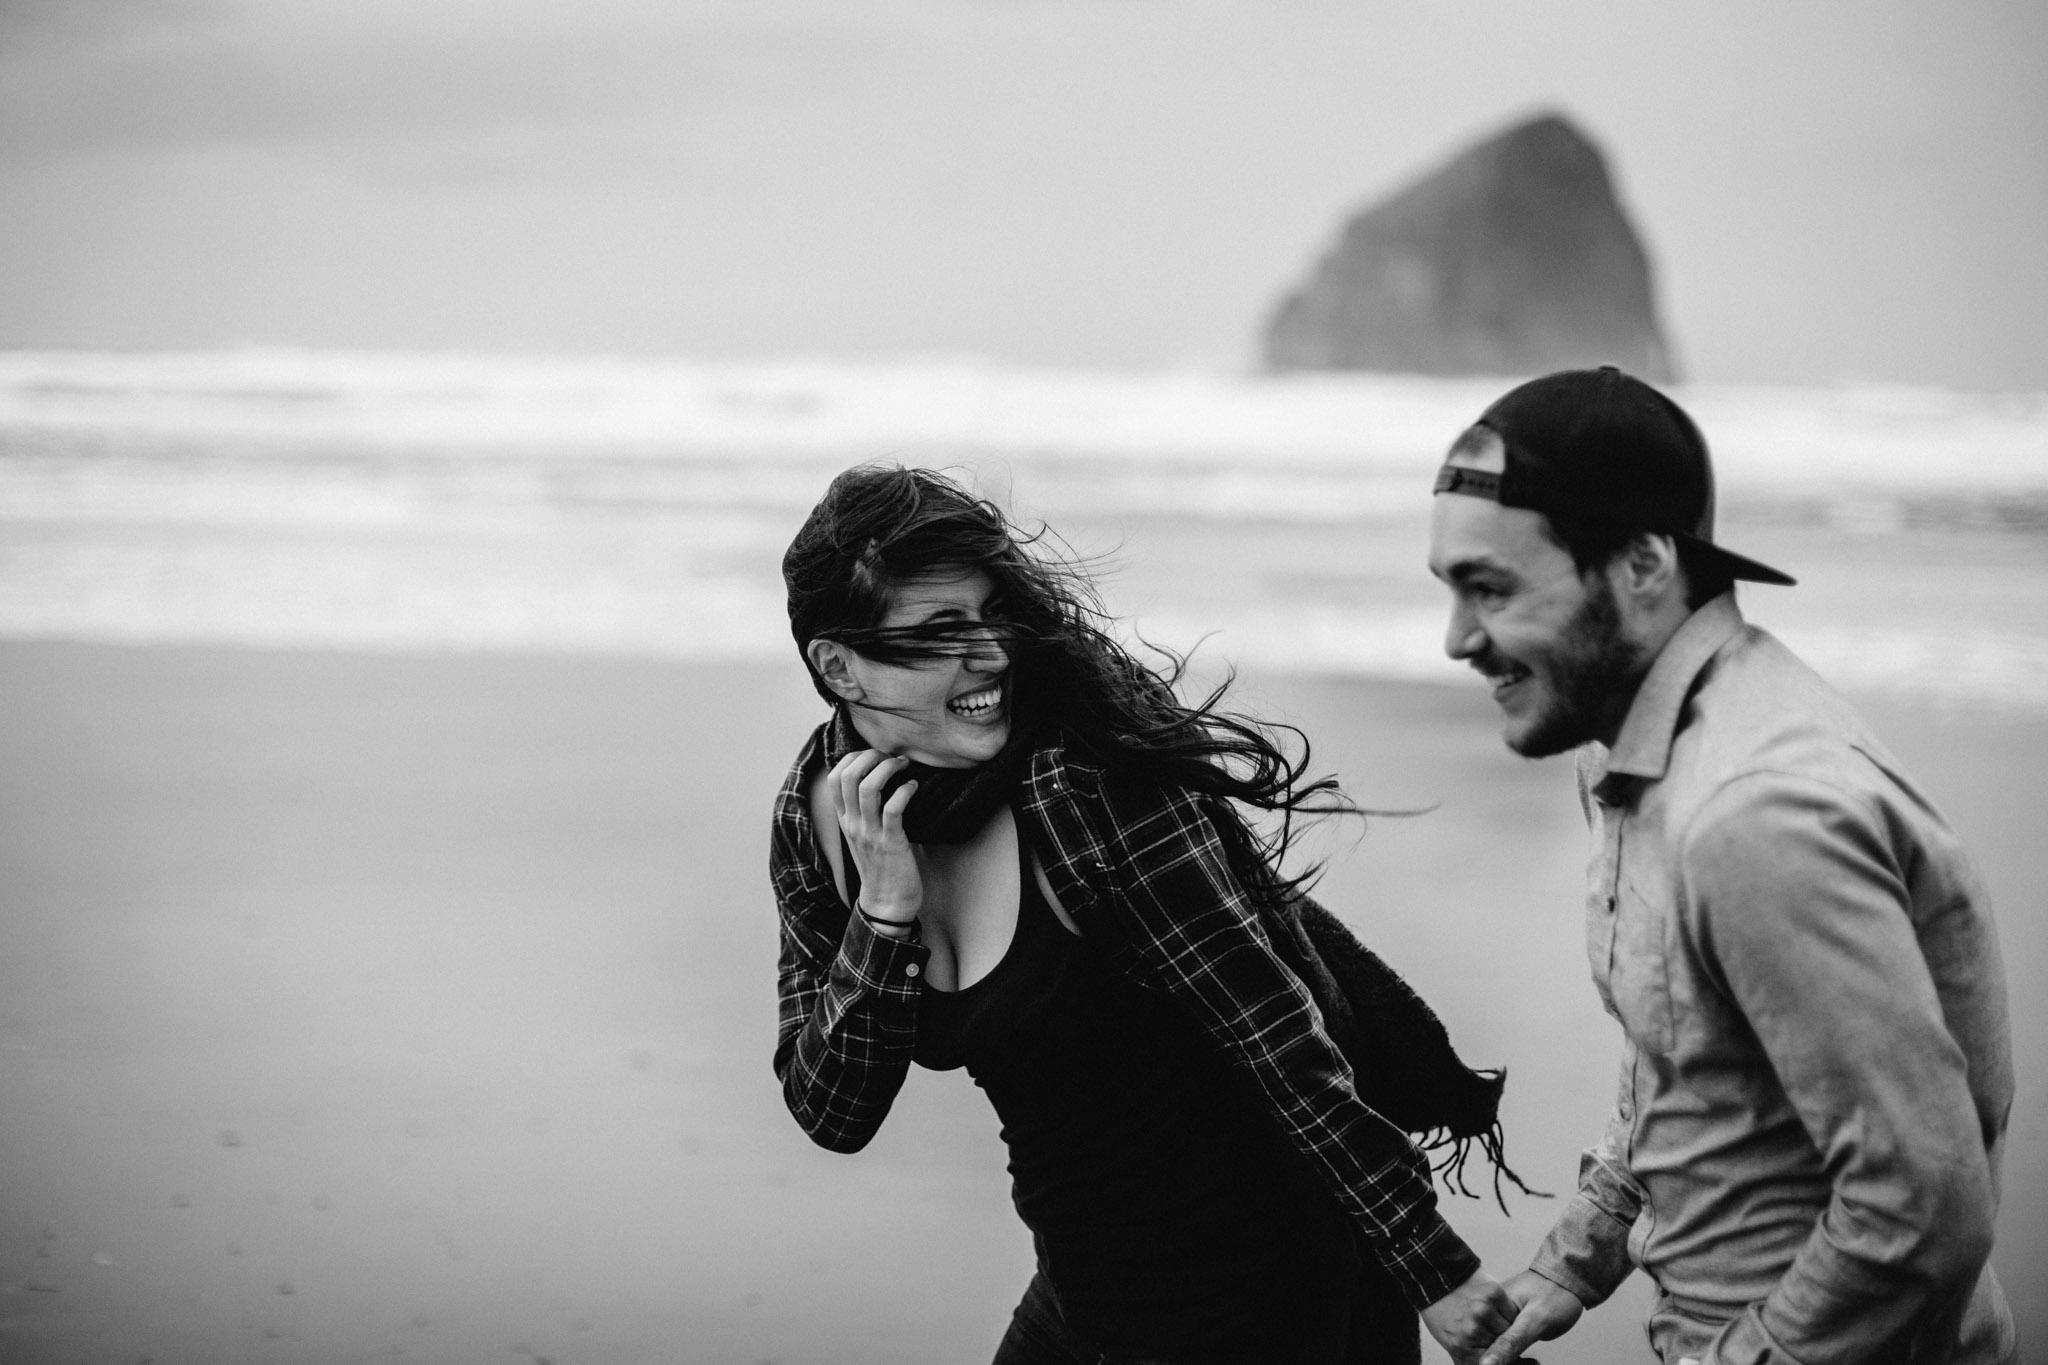 Oregon-Cape-Kiwanda-Engagement-Pia-Anna-Christian-Wedding-Photography-PNW-CJ-12.jpg